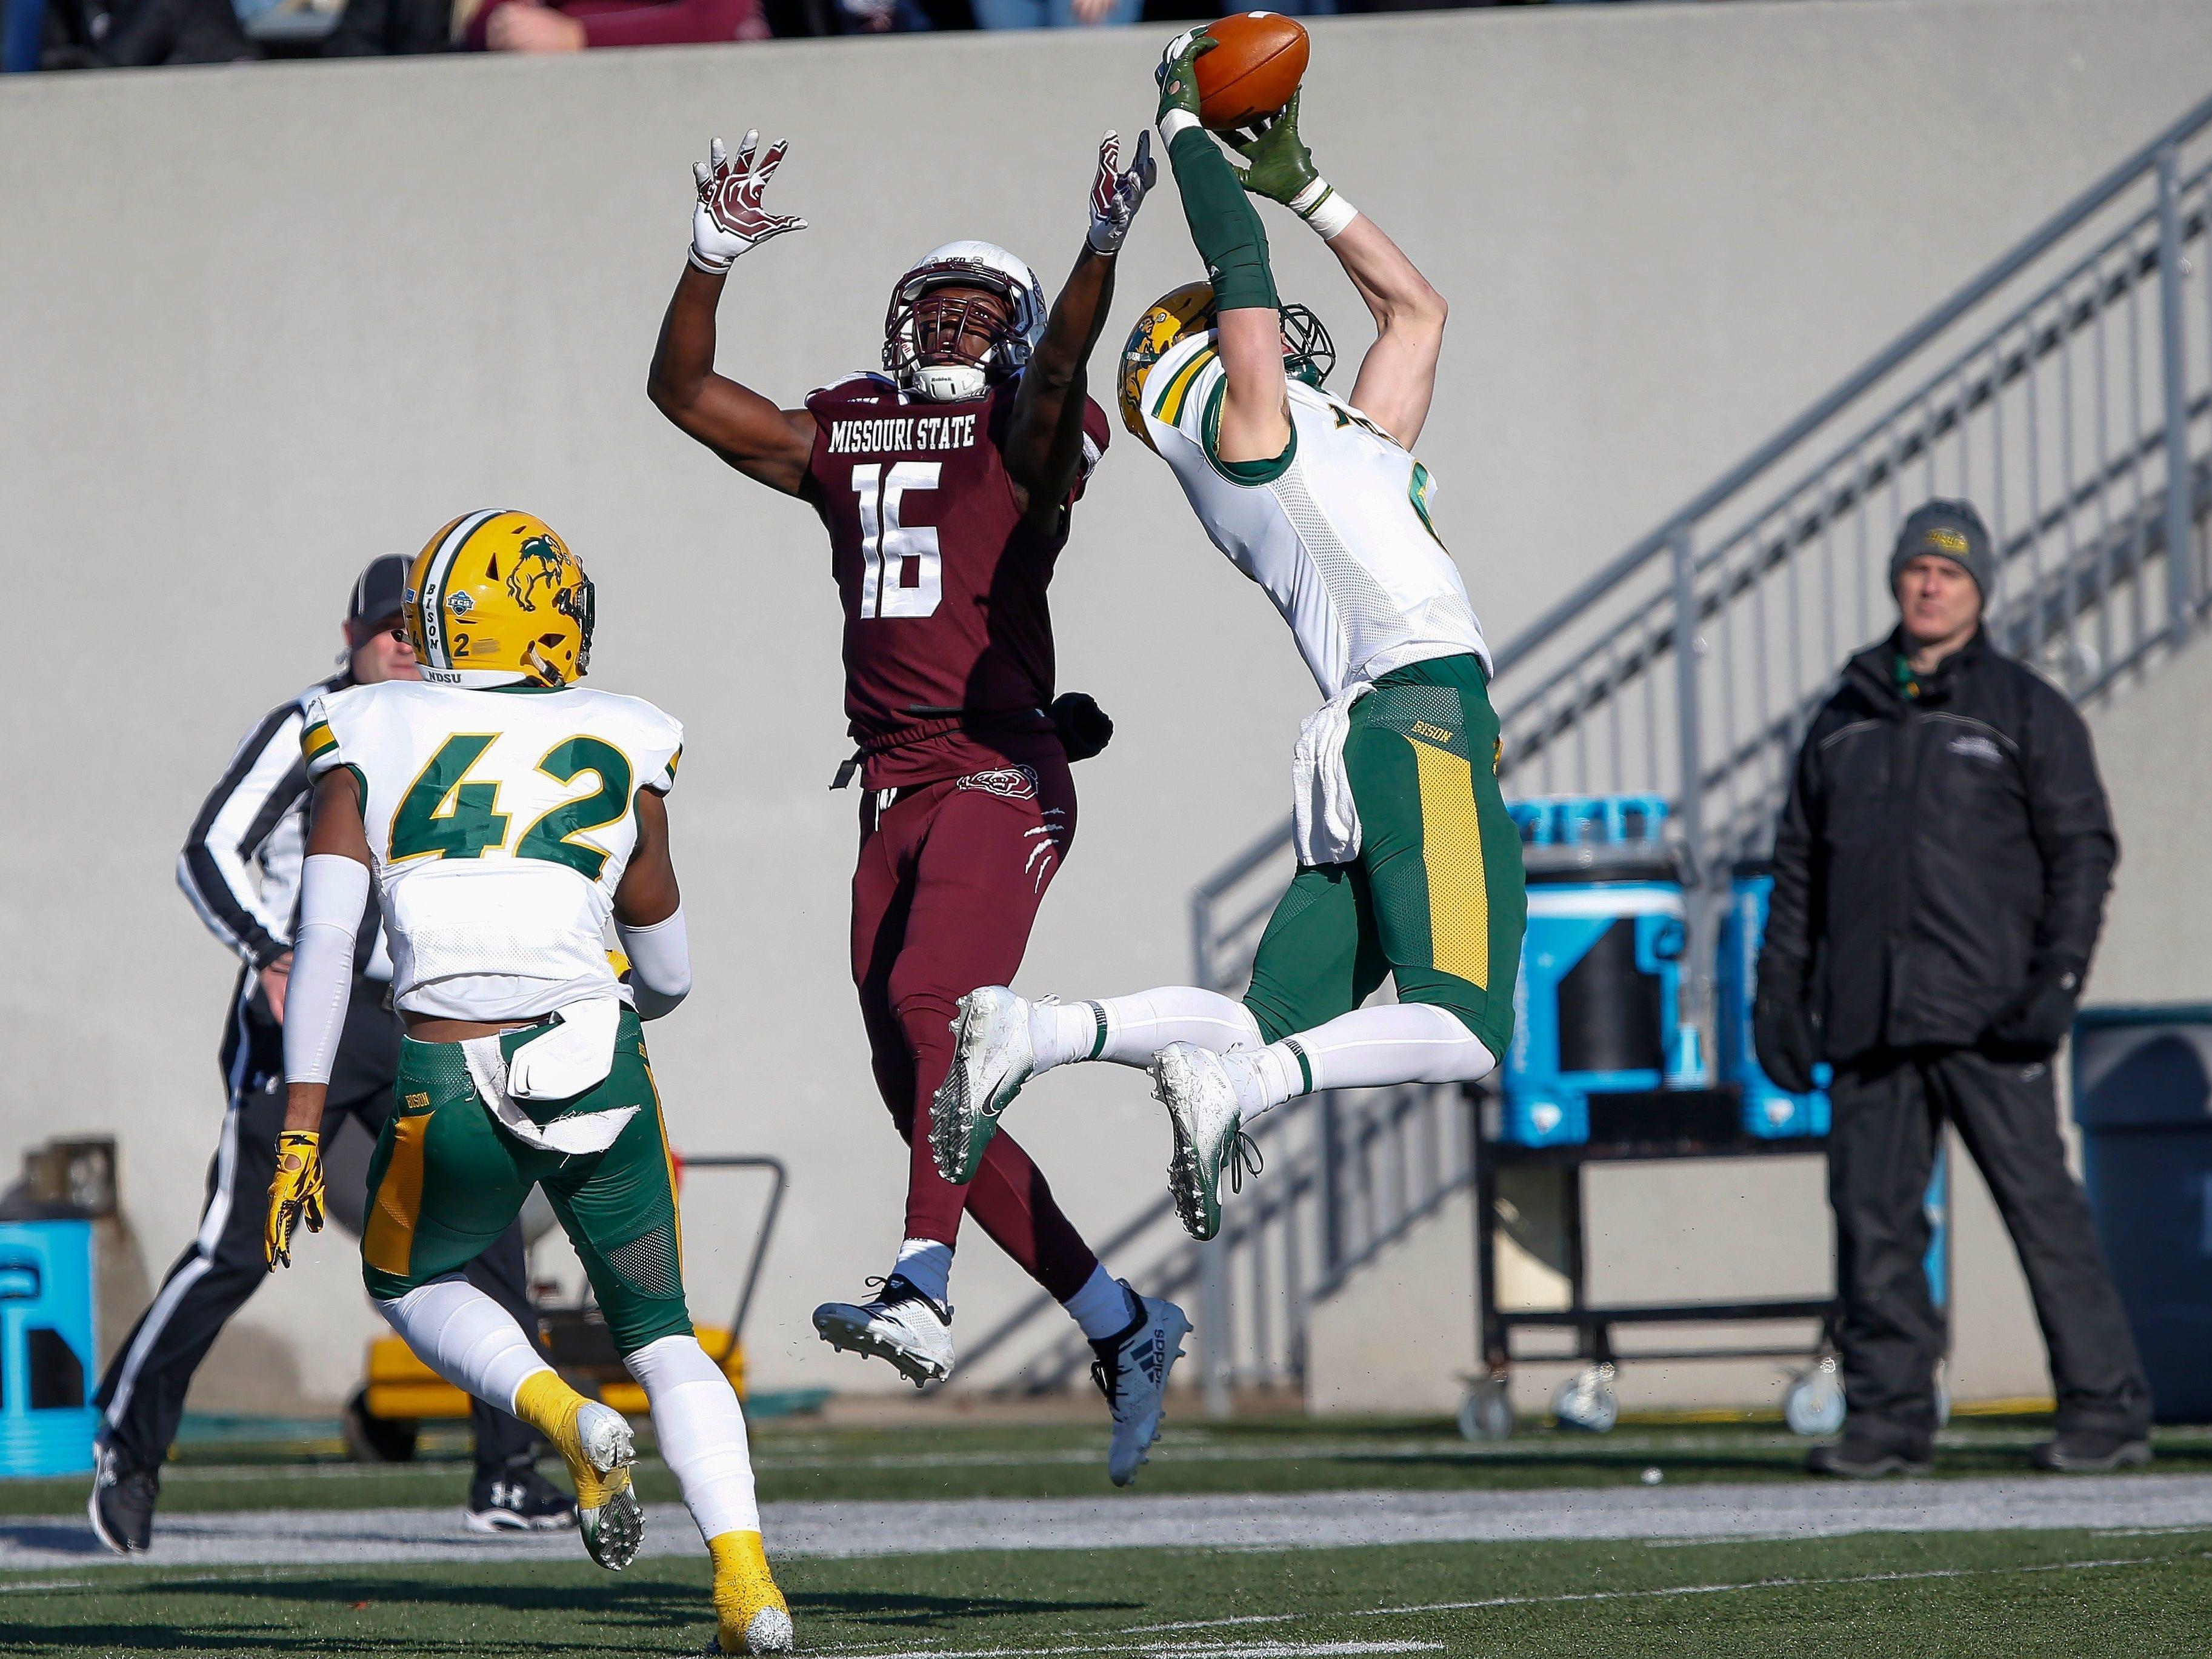 Nov. 10: North Dakota State beats Missouri State football during late season collapse.